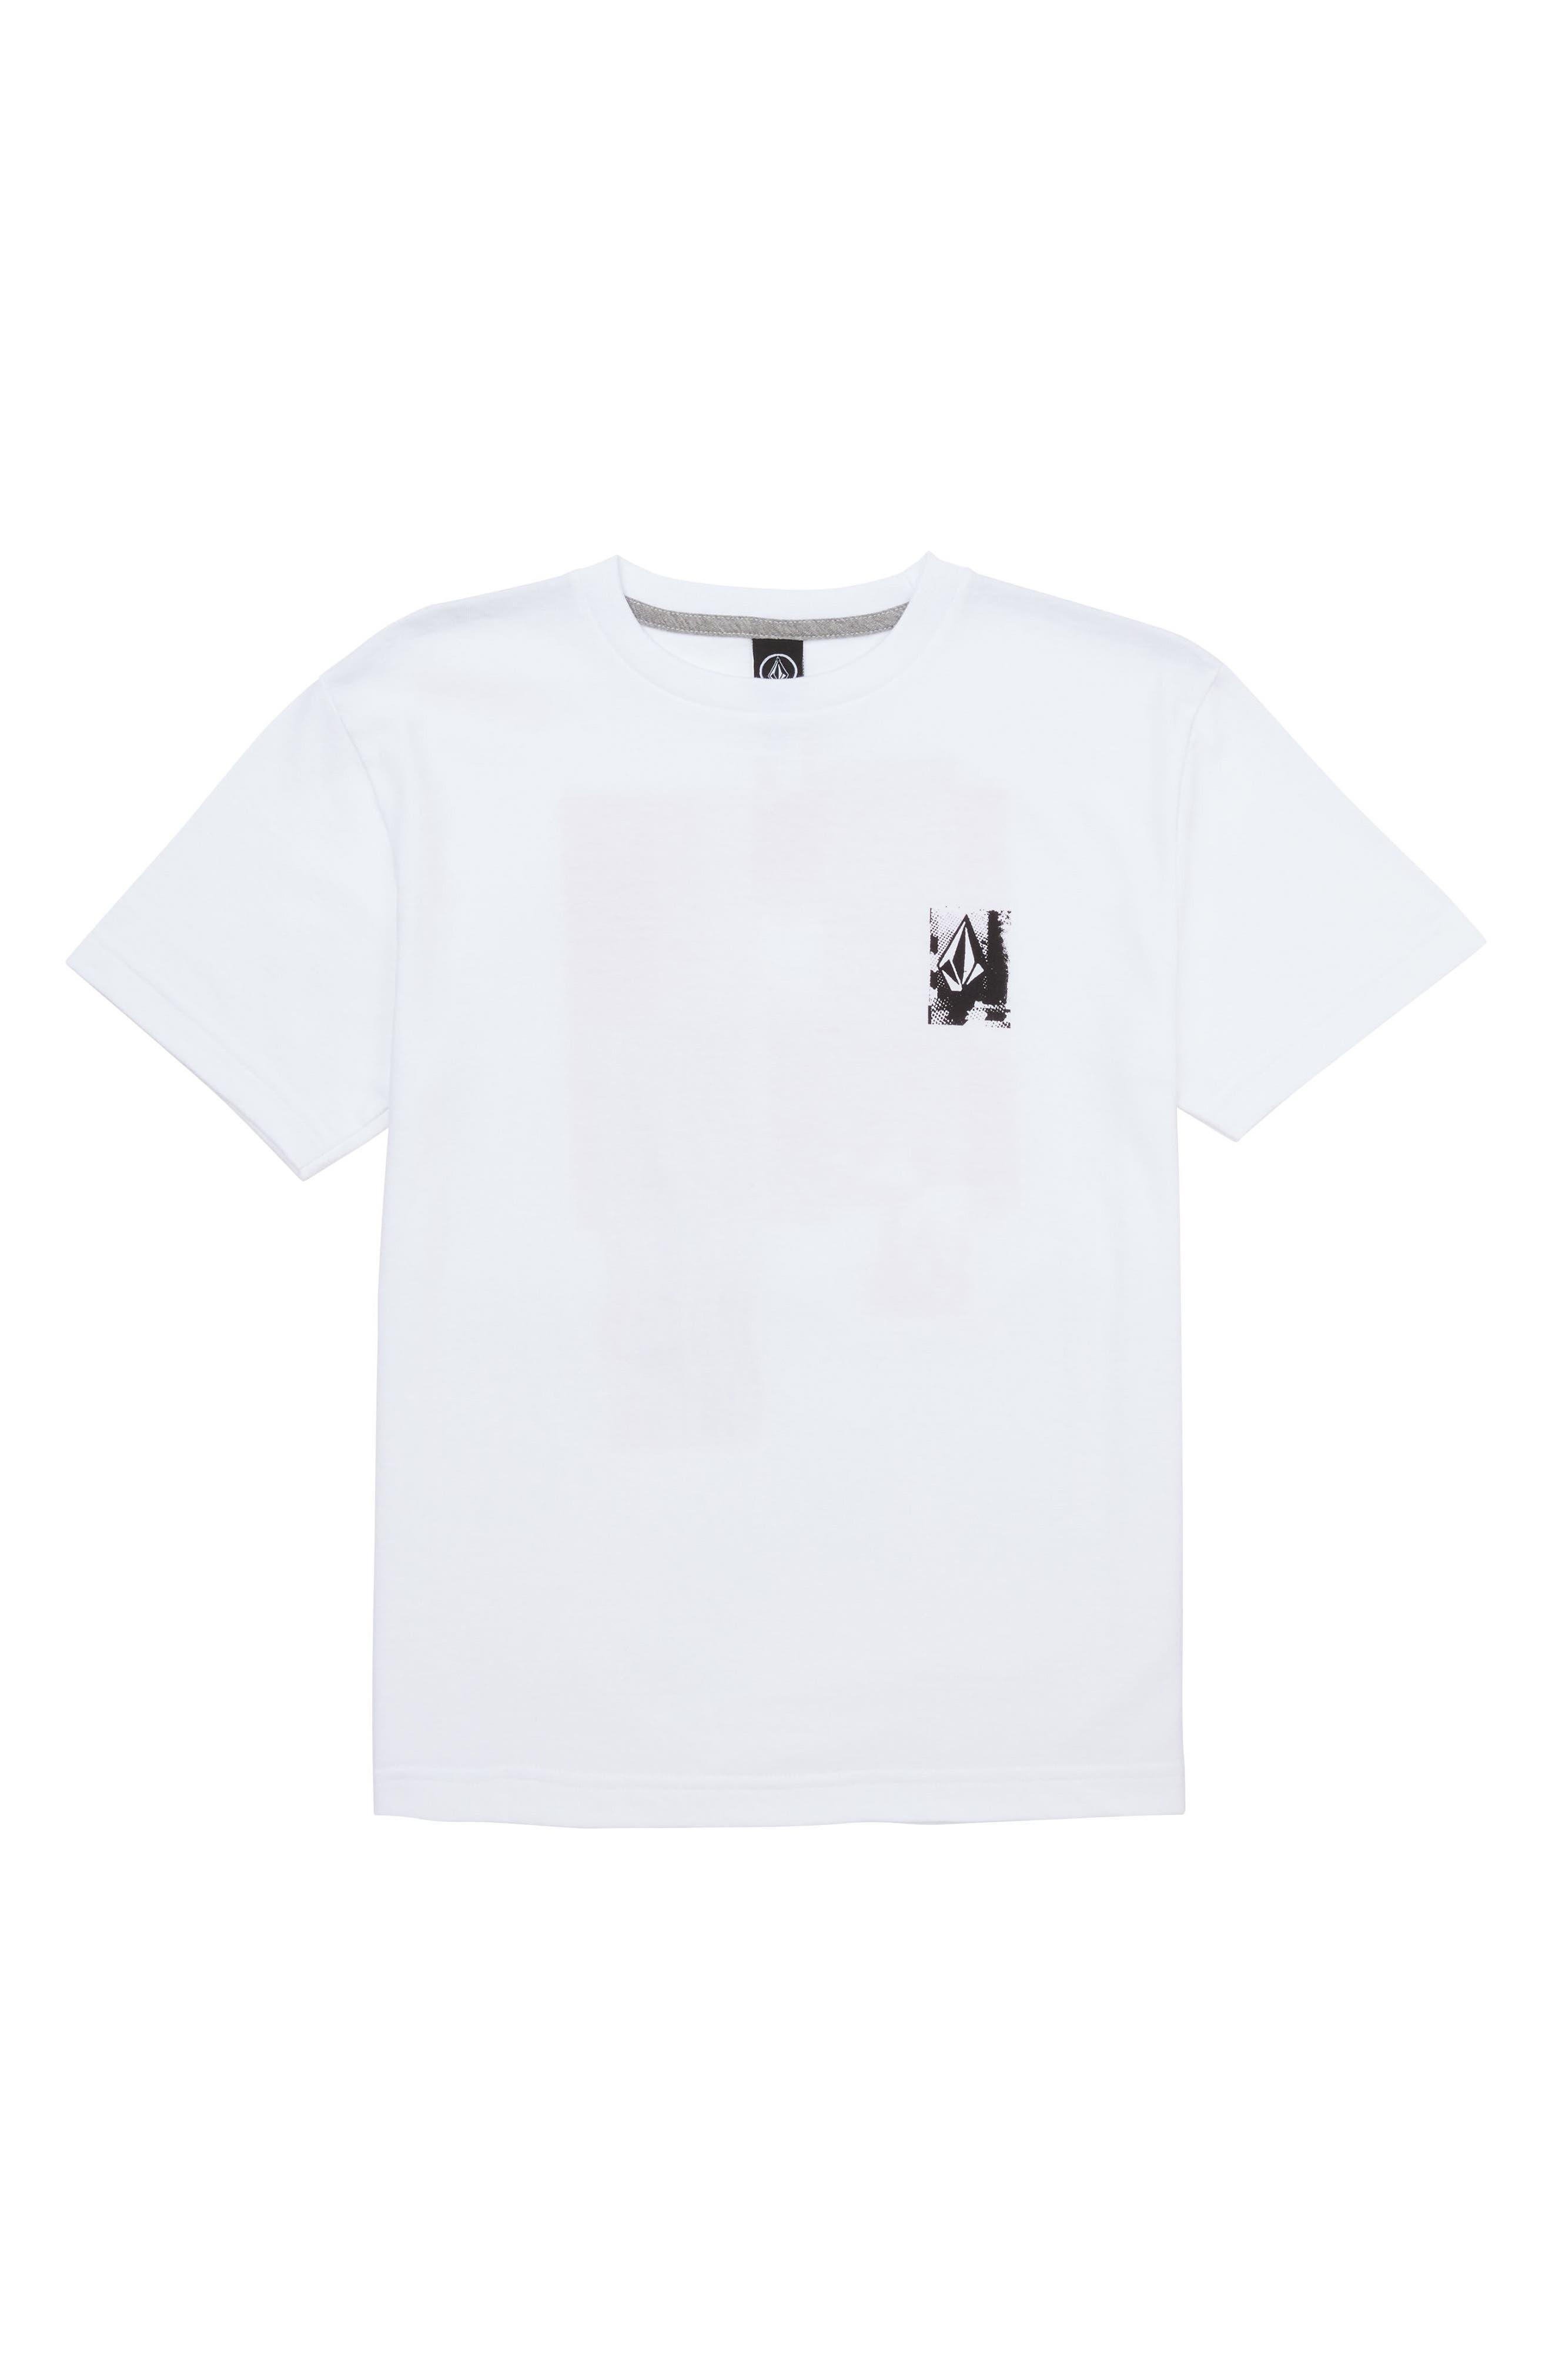 Lifer Graphic T-Shirt,                             Main thumbnail 1, color,                             White